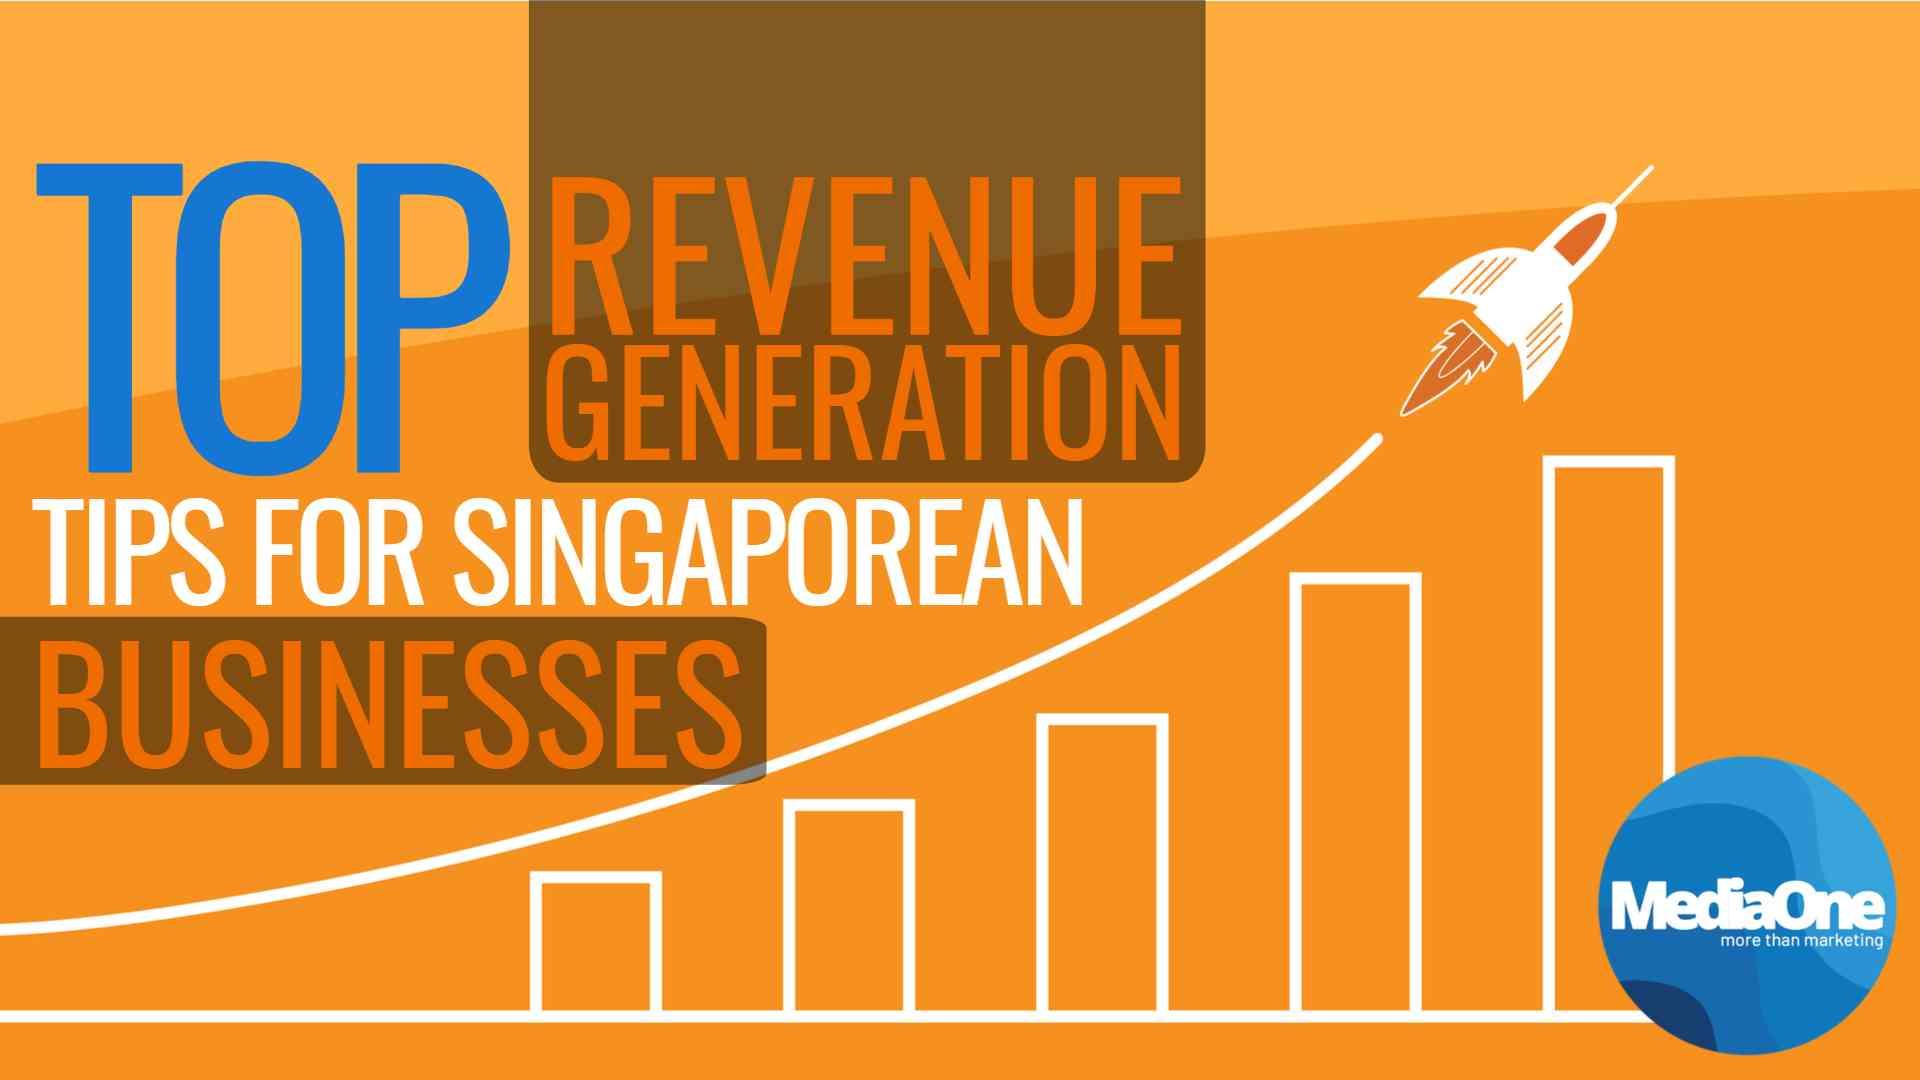 Top Revenue Generation Tips For Singaporean Businesses